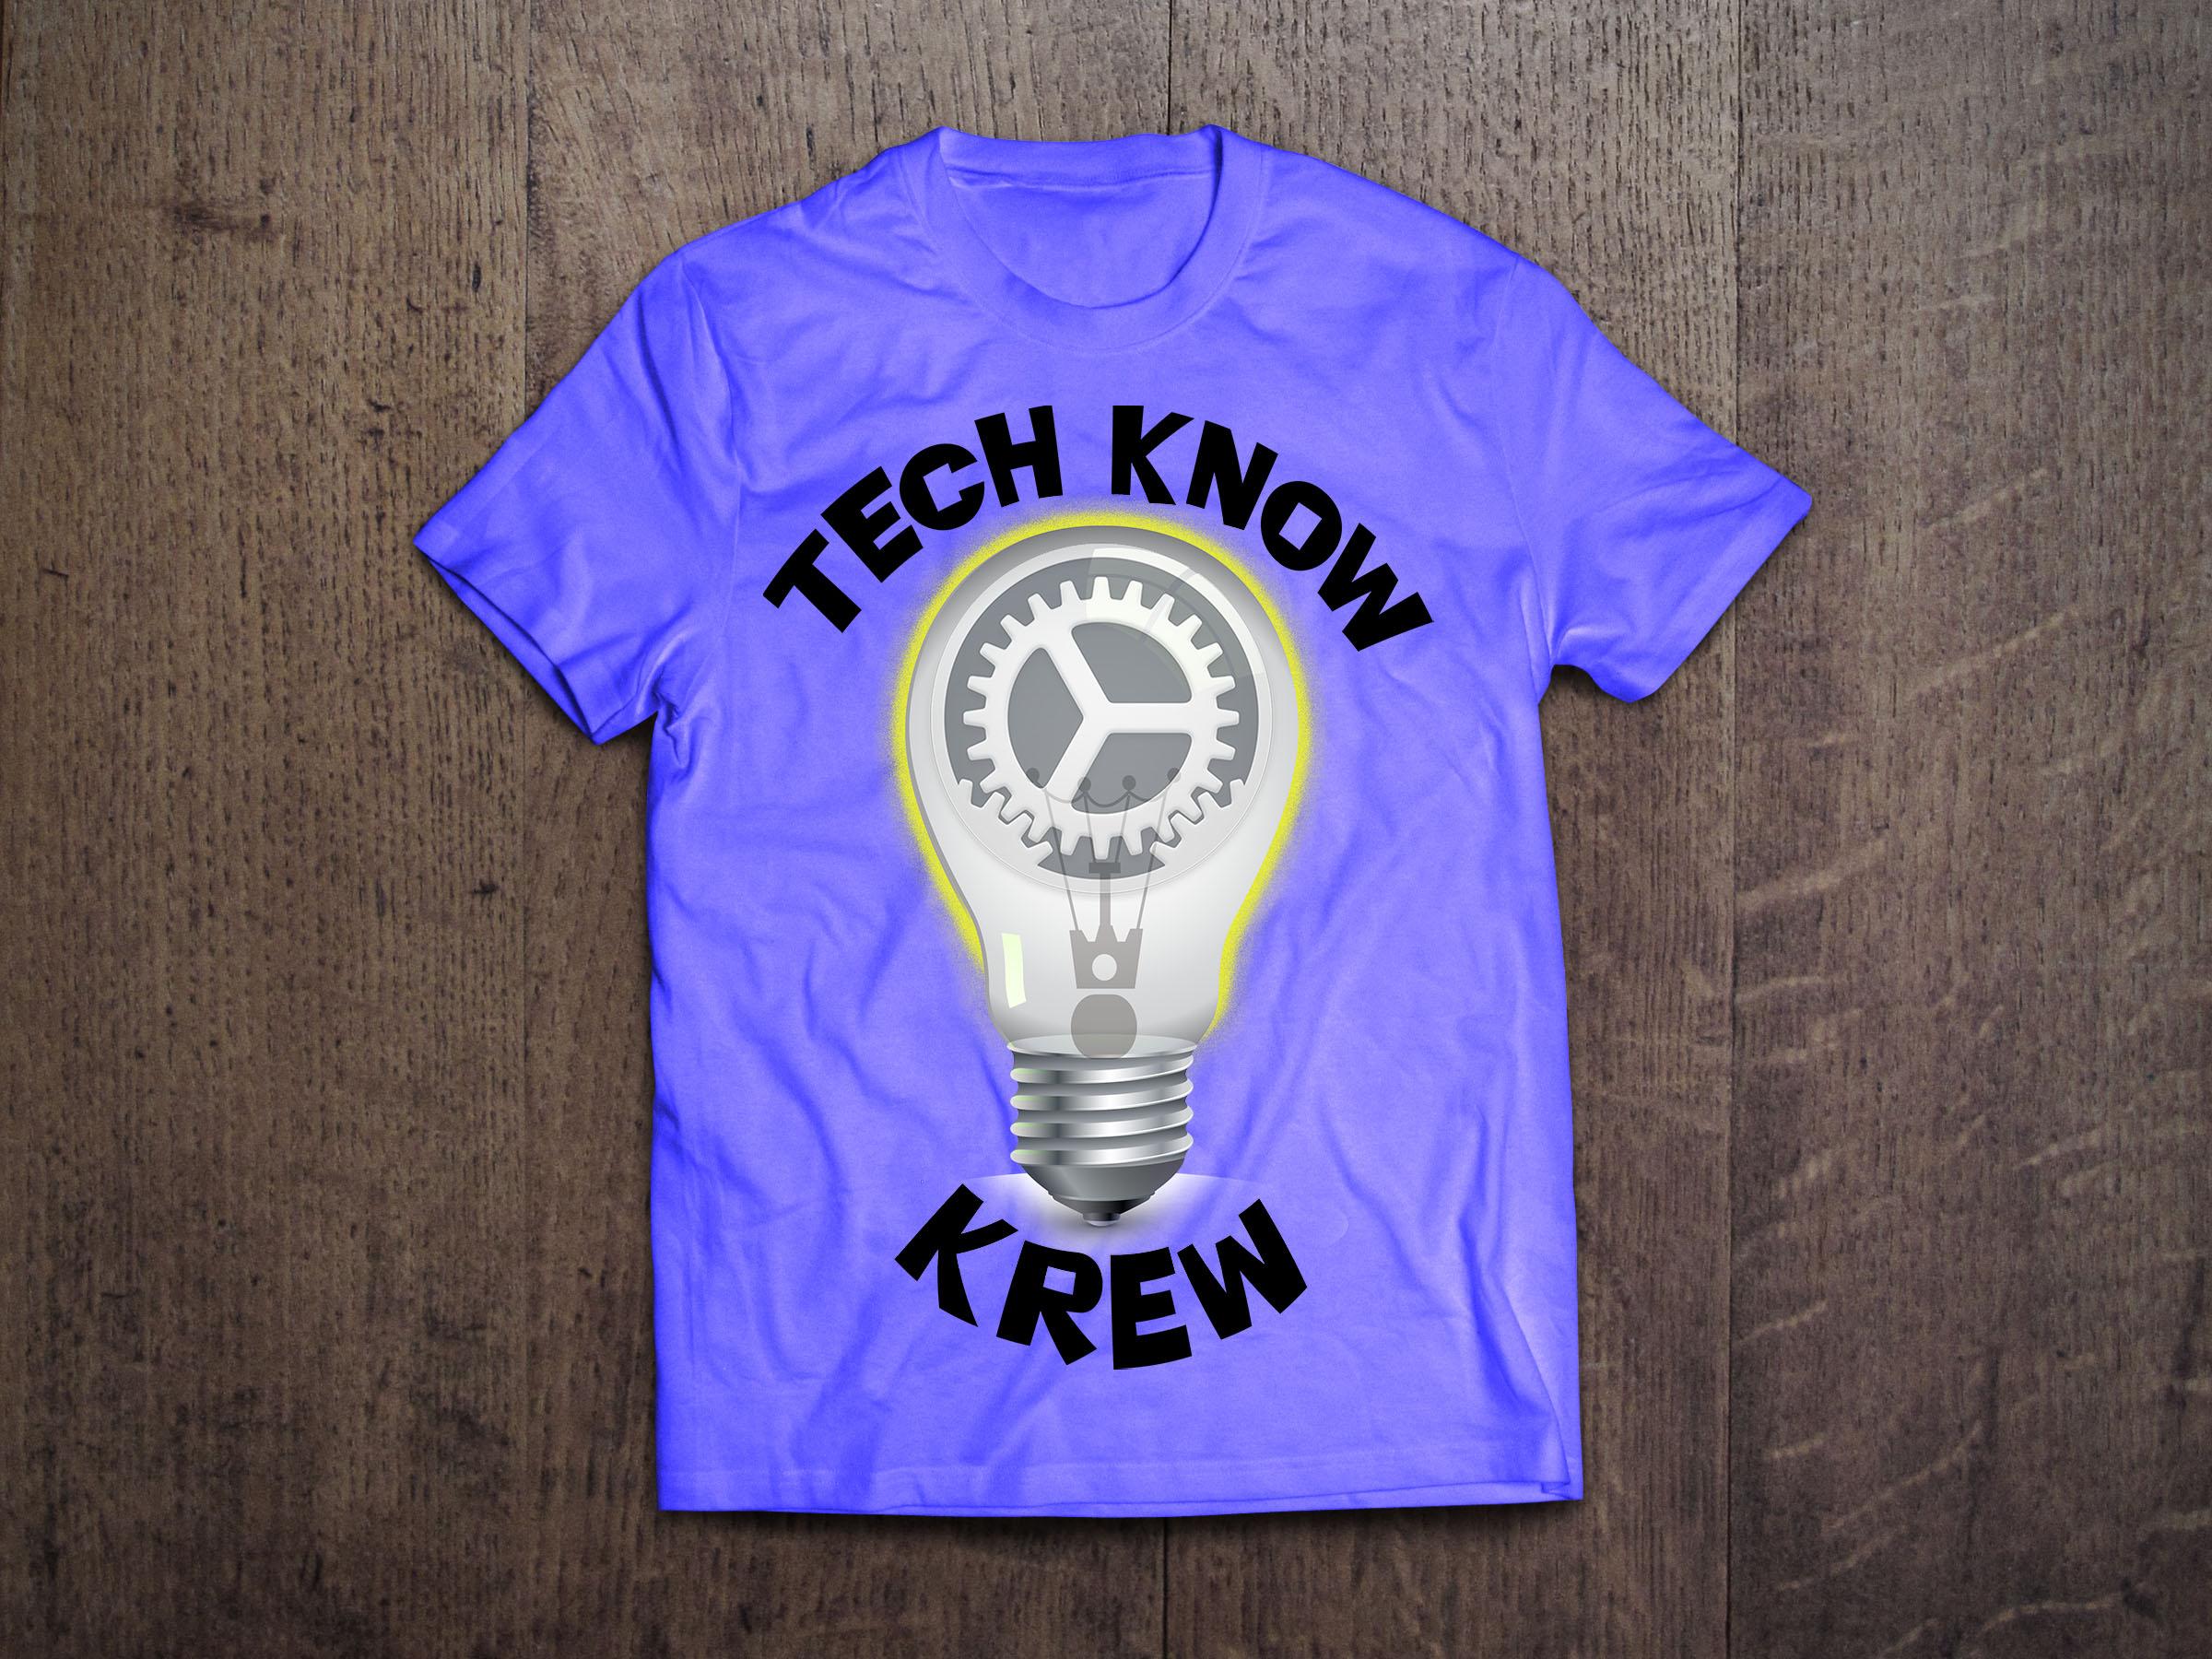 tech know crew